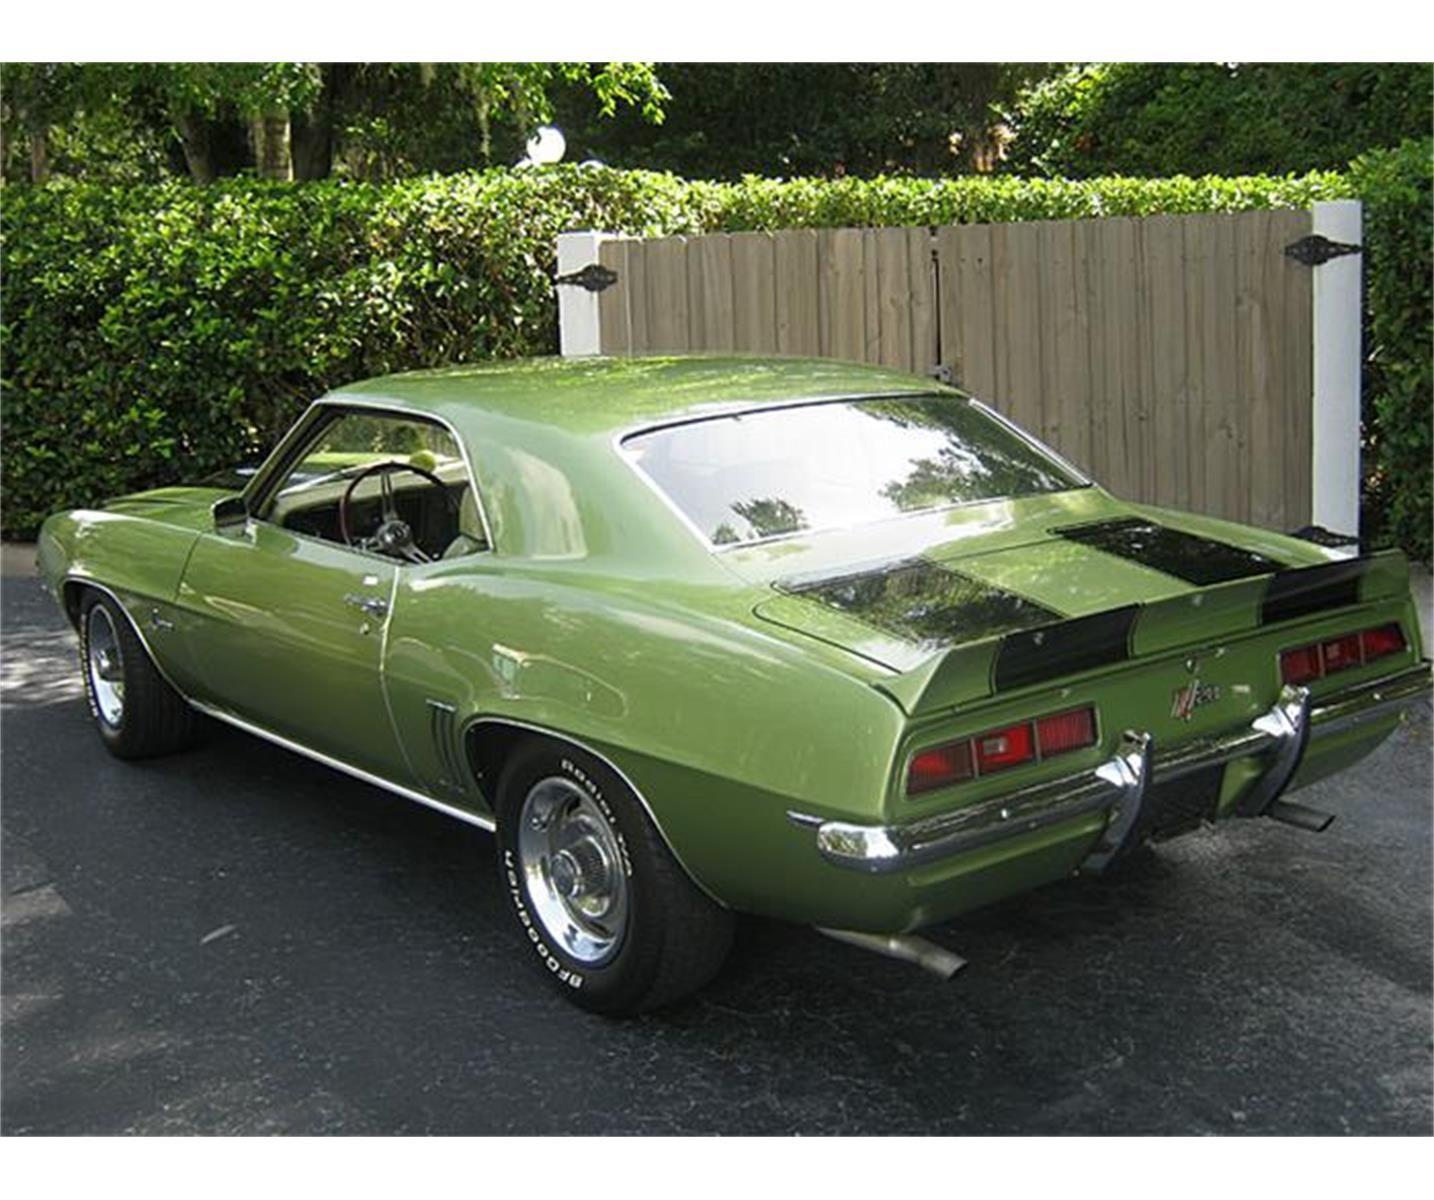 For Sale: 1969 Chevrolet Camaro Z28 in Mount Dora (Orlando), Florida